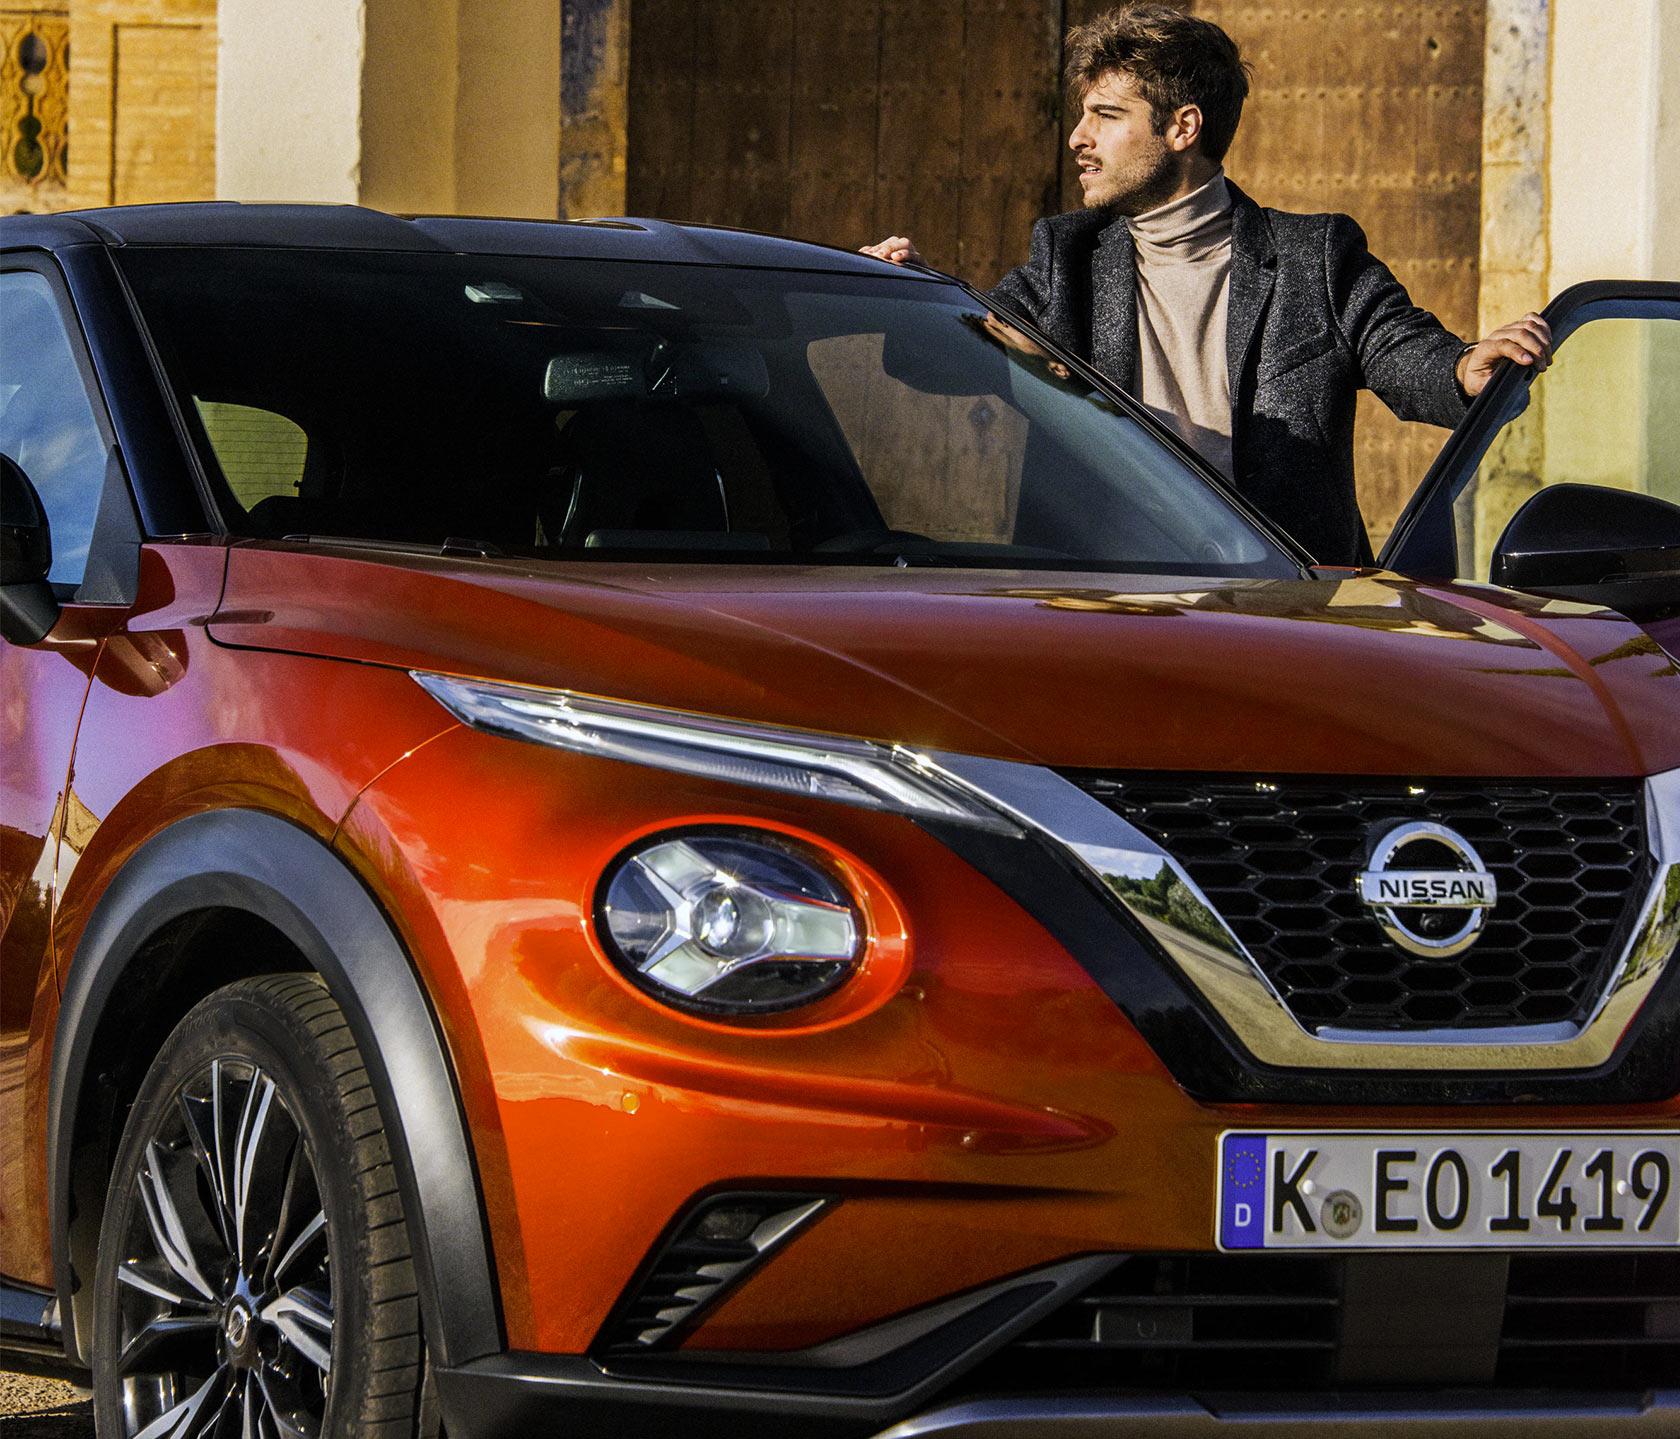 La Nissan Juke marque les esprits - Magazine Trajectoire